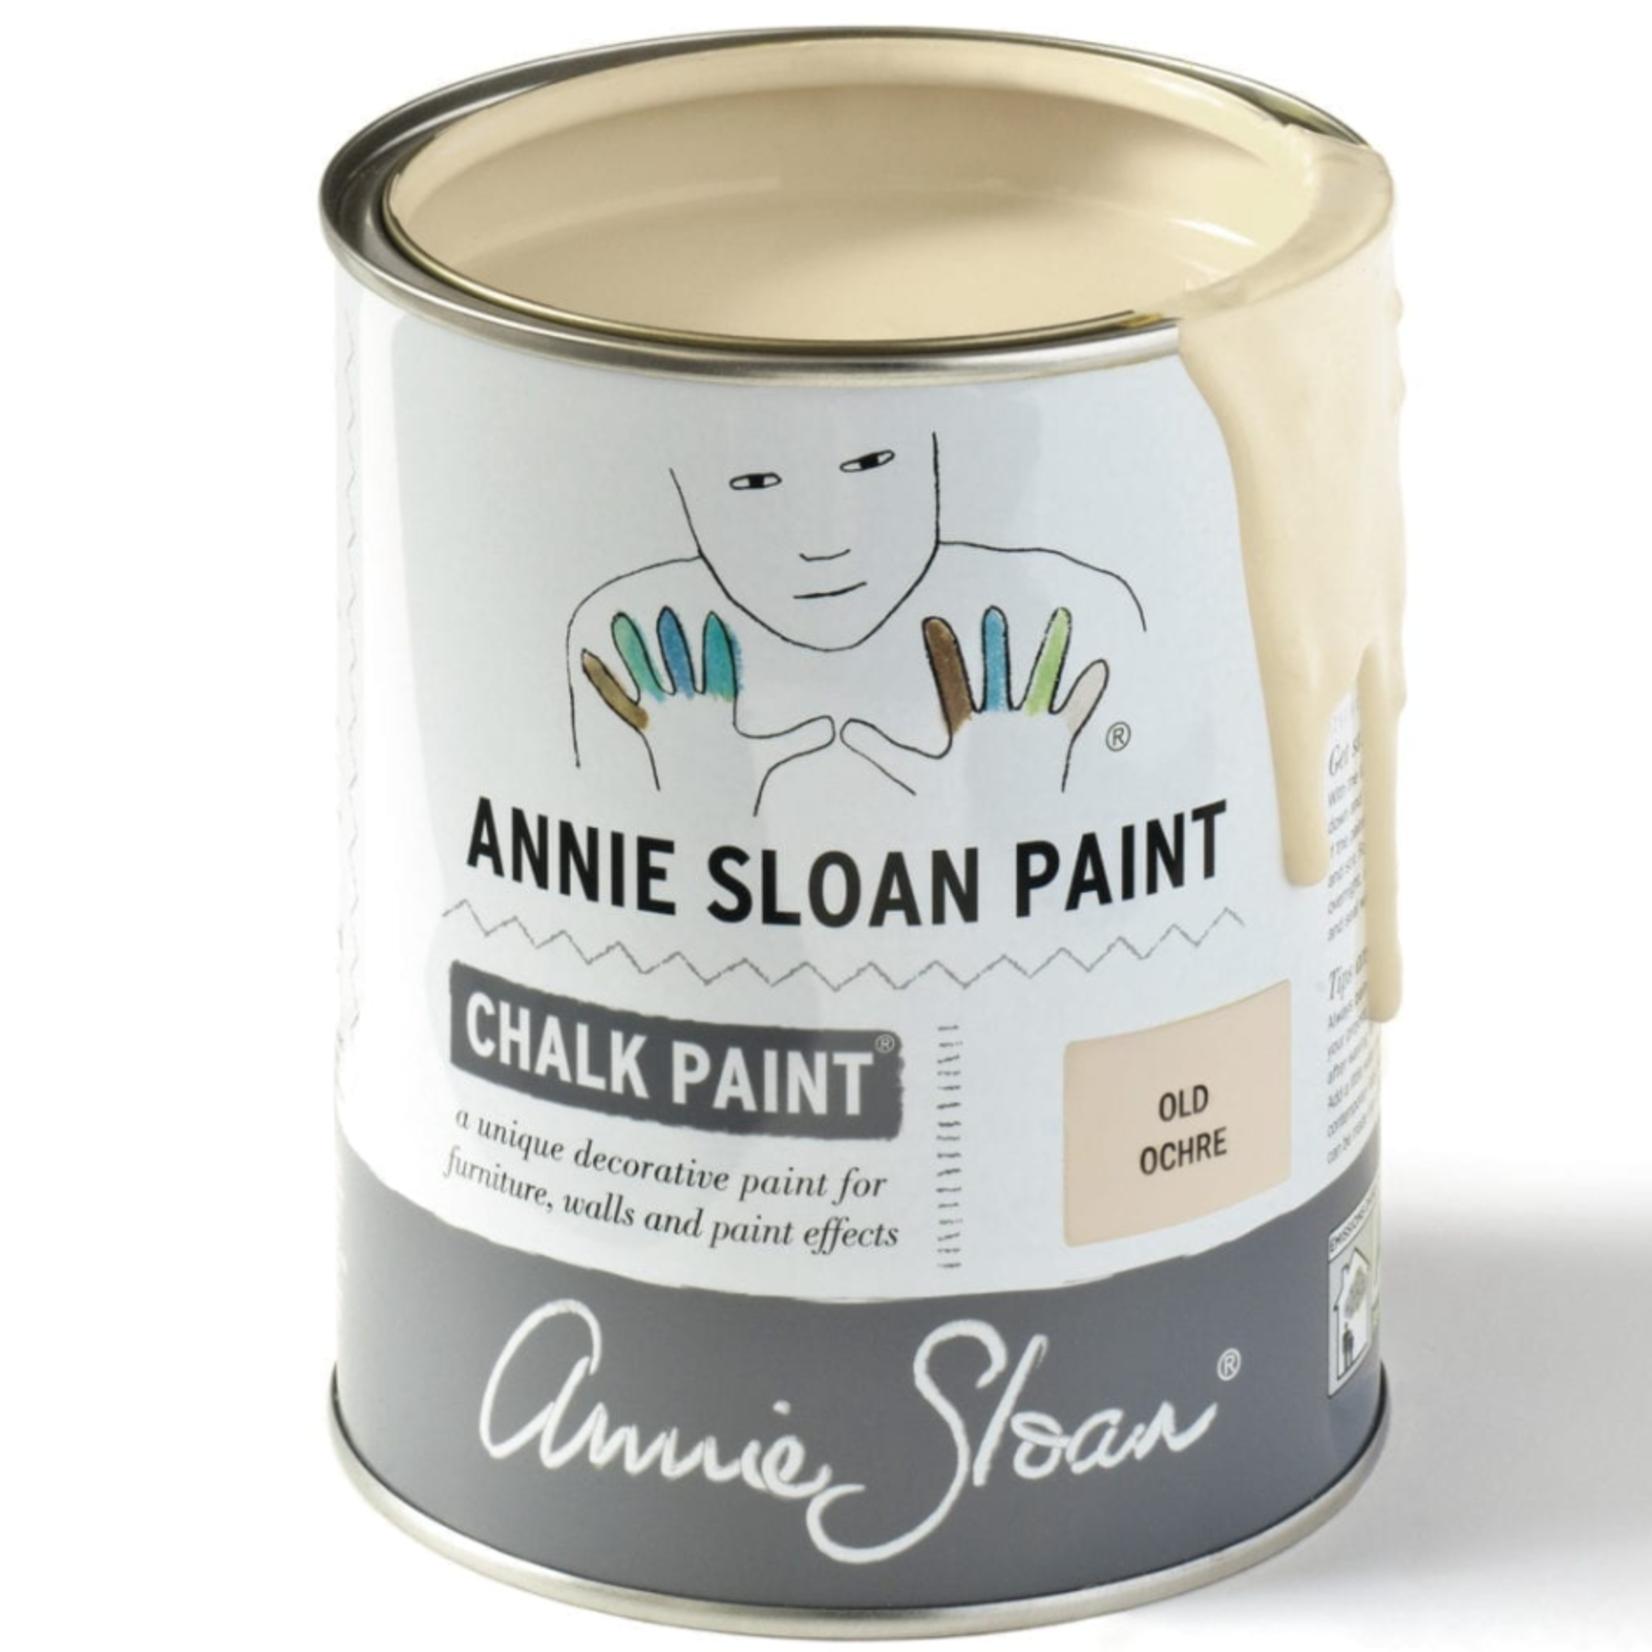 Annie Sloan Annie Sloan Old Ochre Chalk Paint